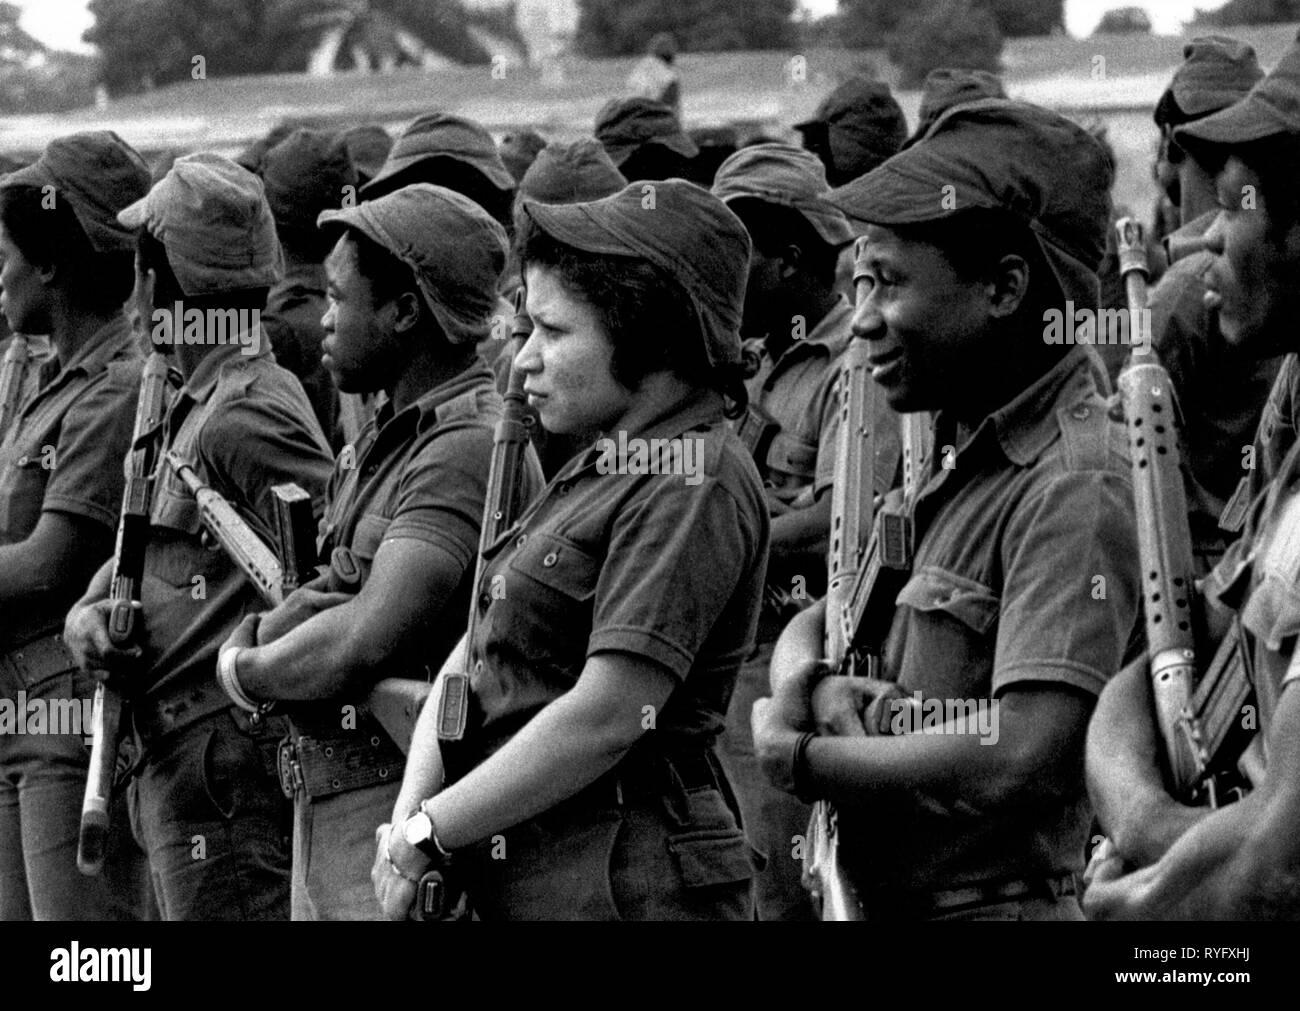 militiamen (and Woman) at MPLA parade, Luanda, Angola - Stock Image